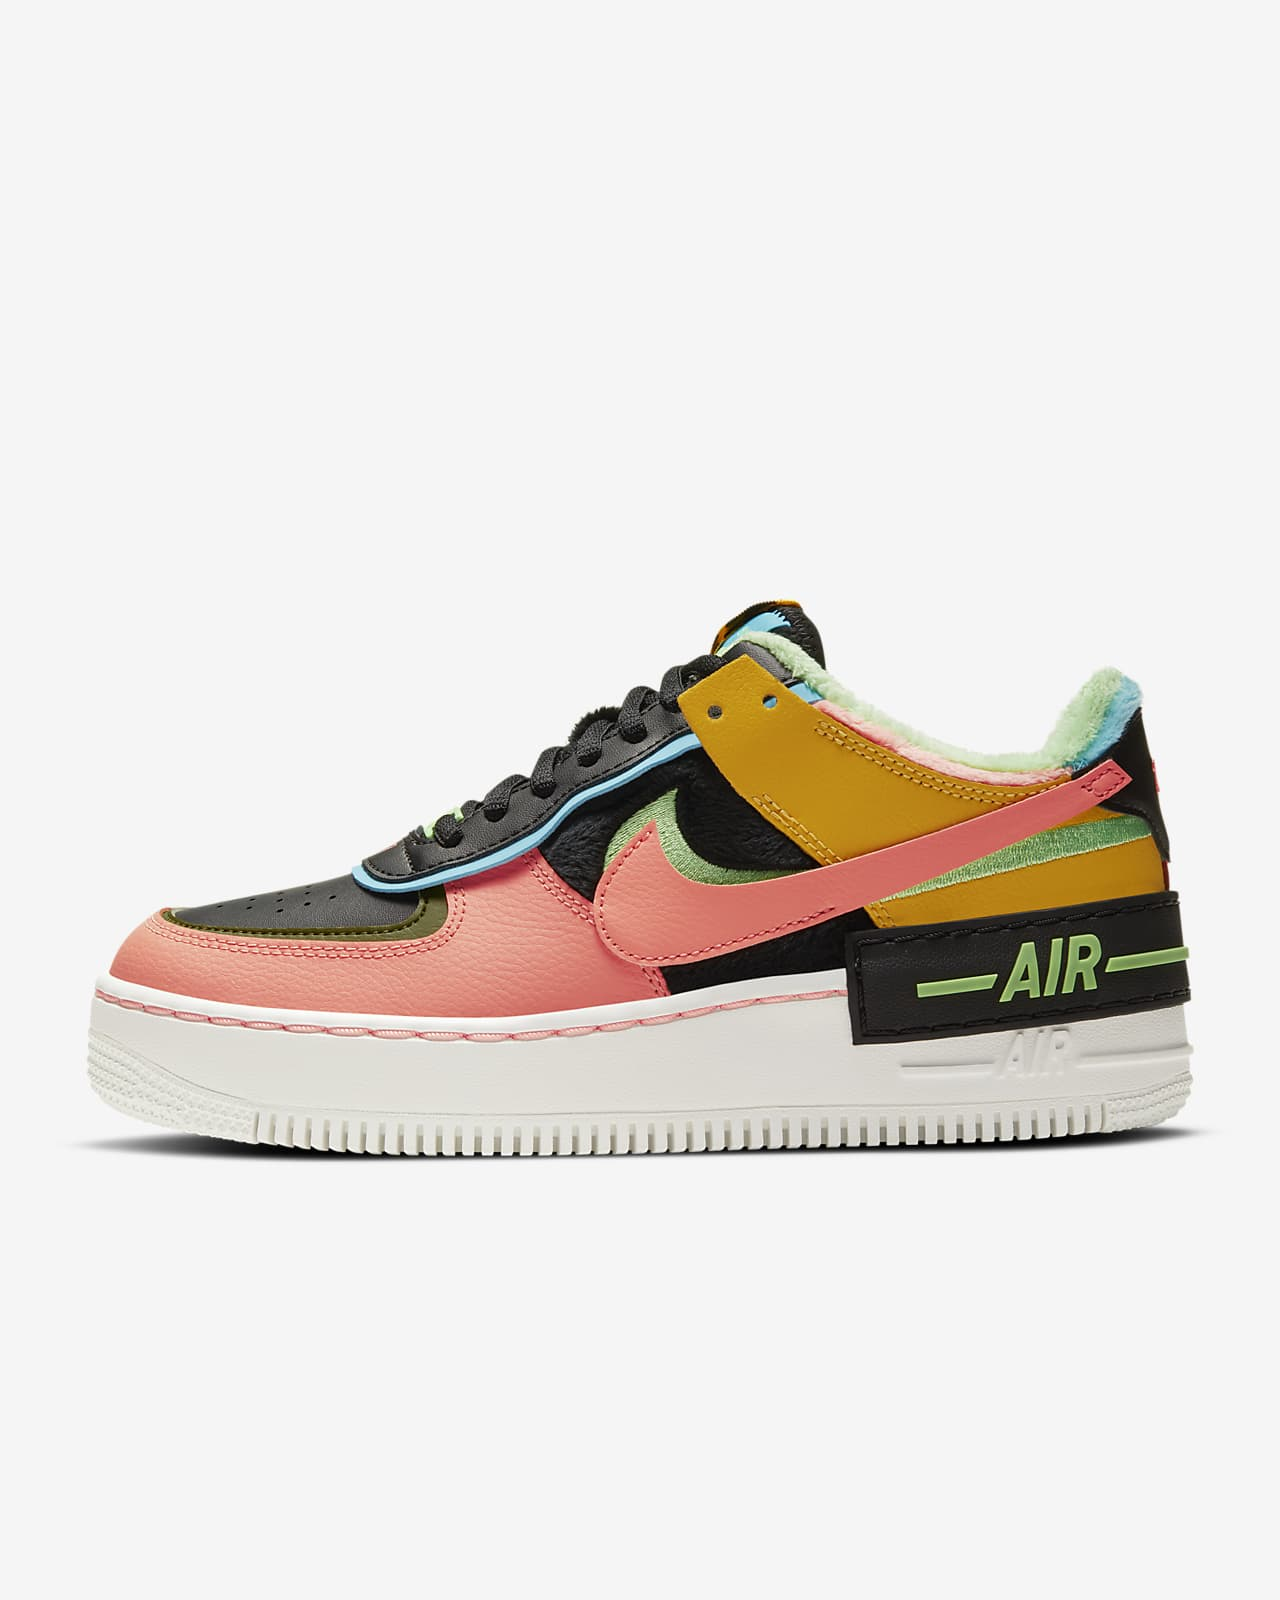 chaussure nike air force 1 femme orange